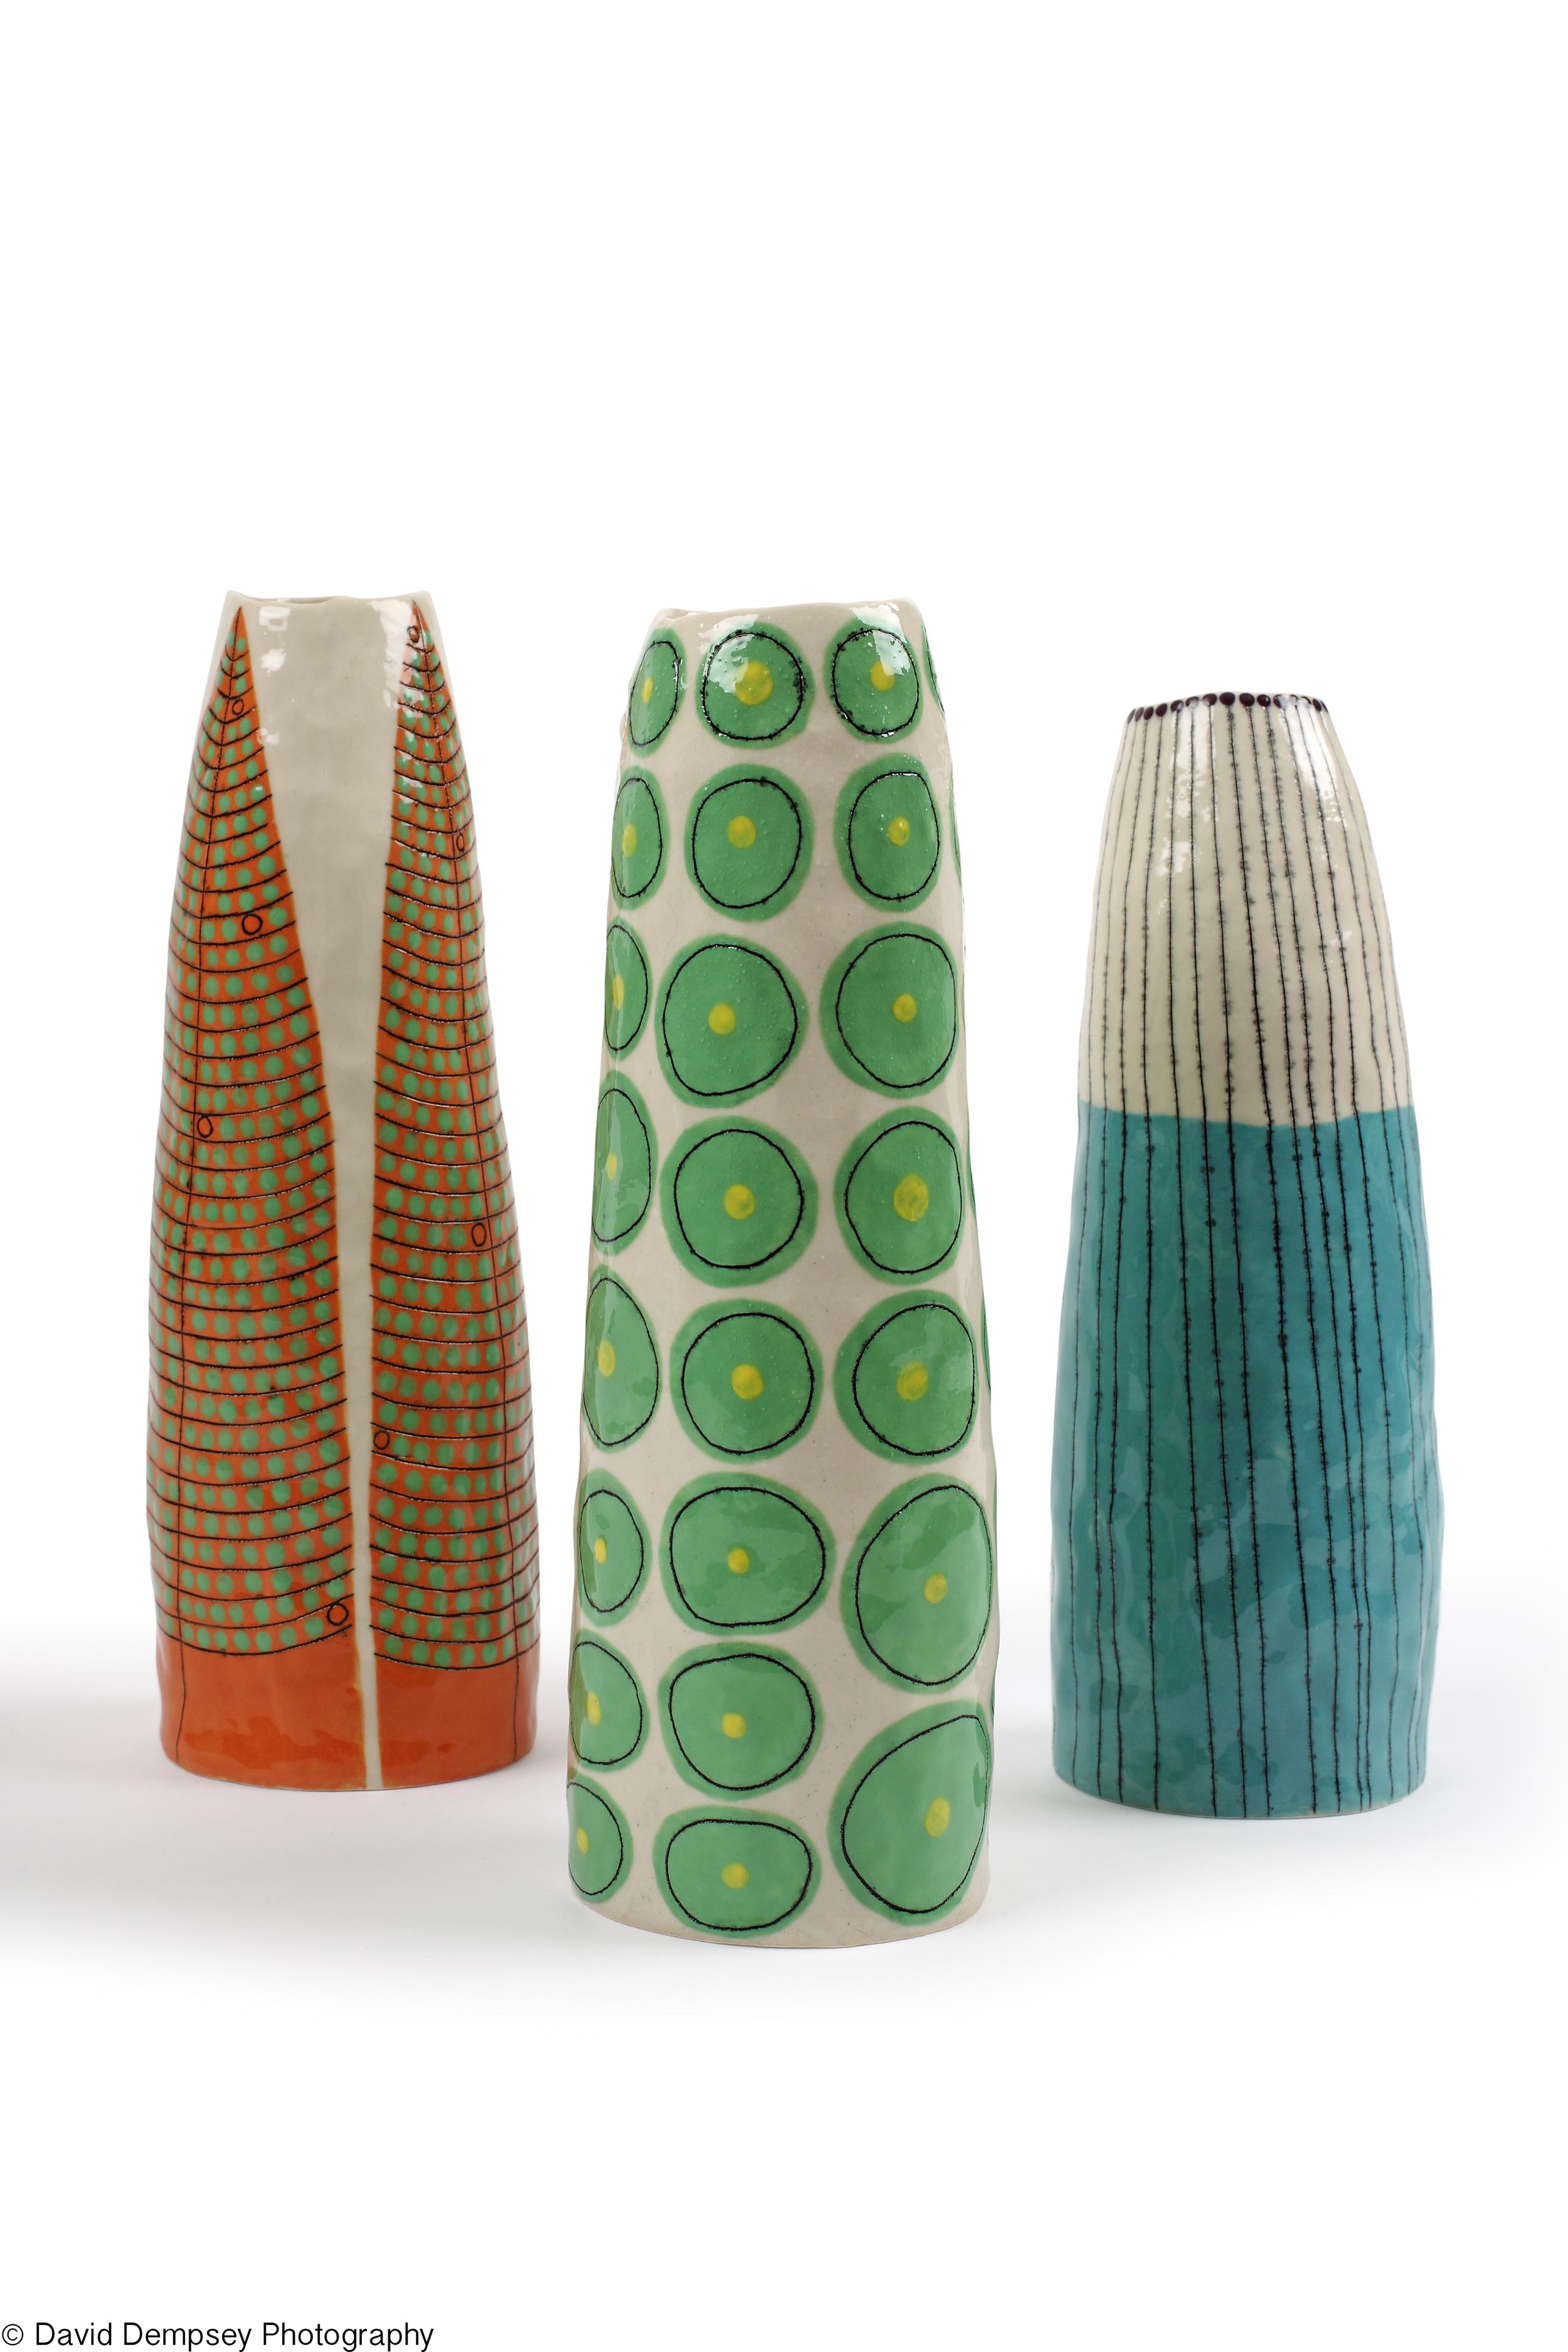 Ceramic designs by Andrew Ludick